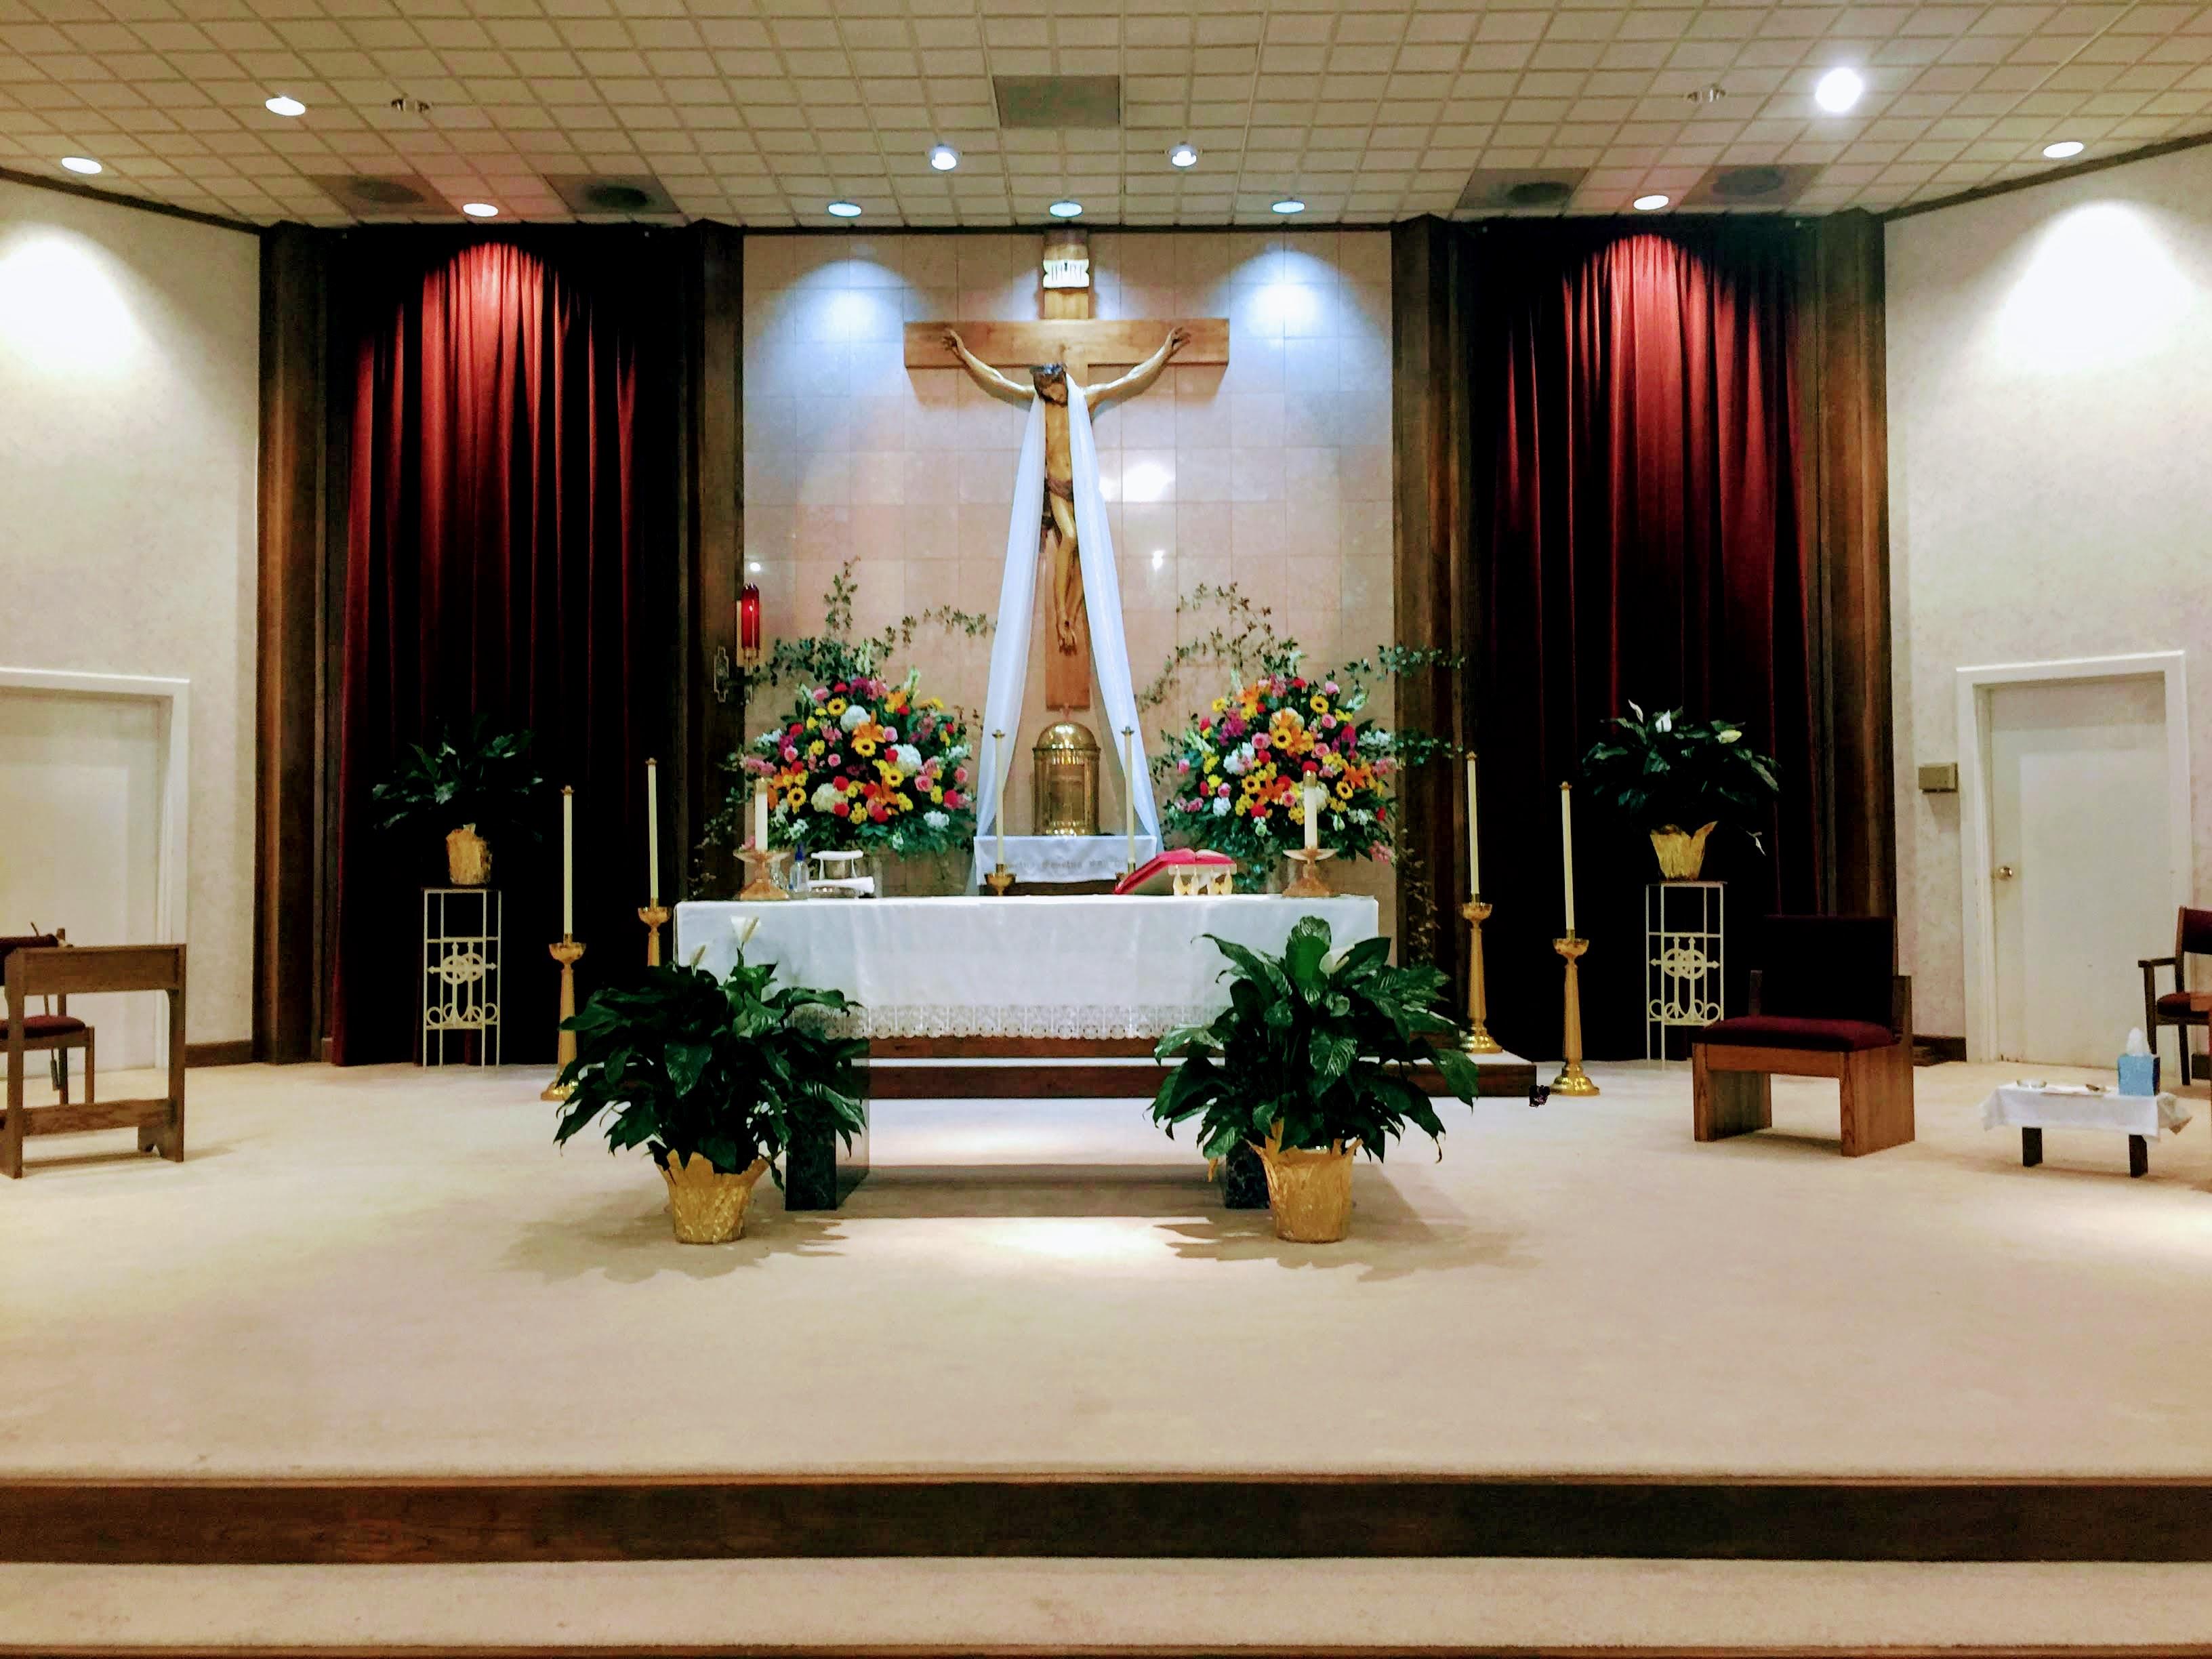 Church sanctuary June 2020